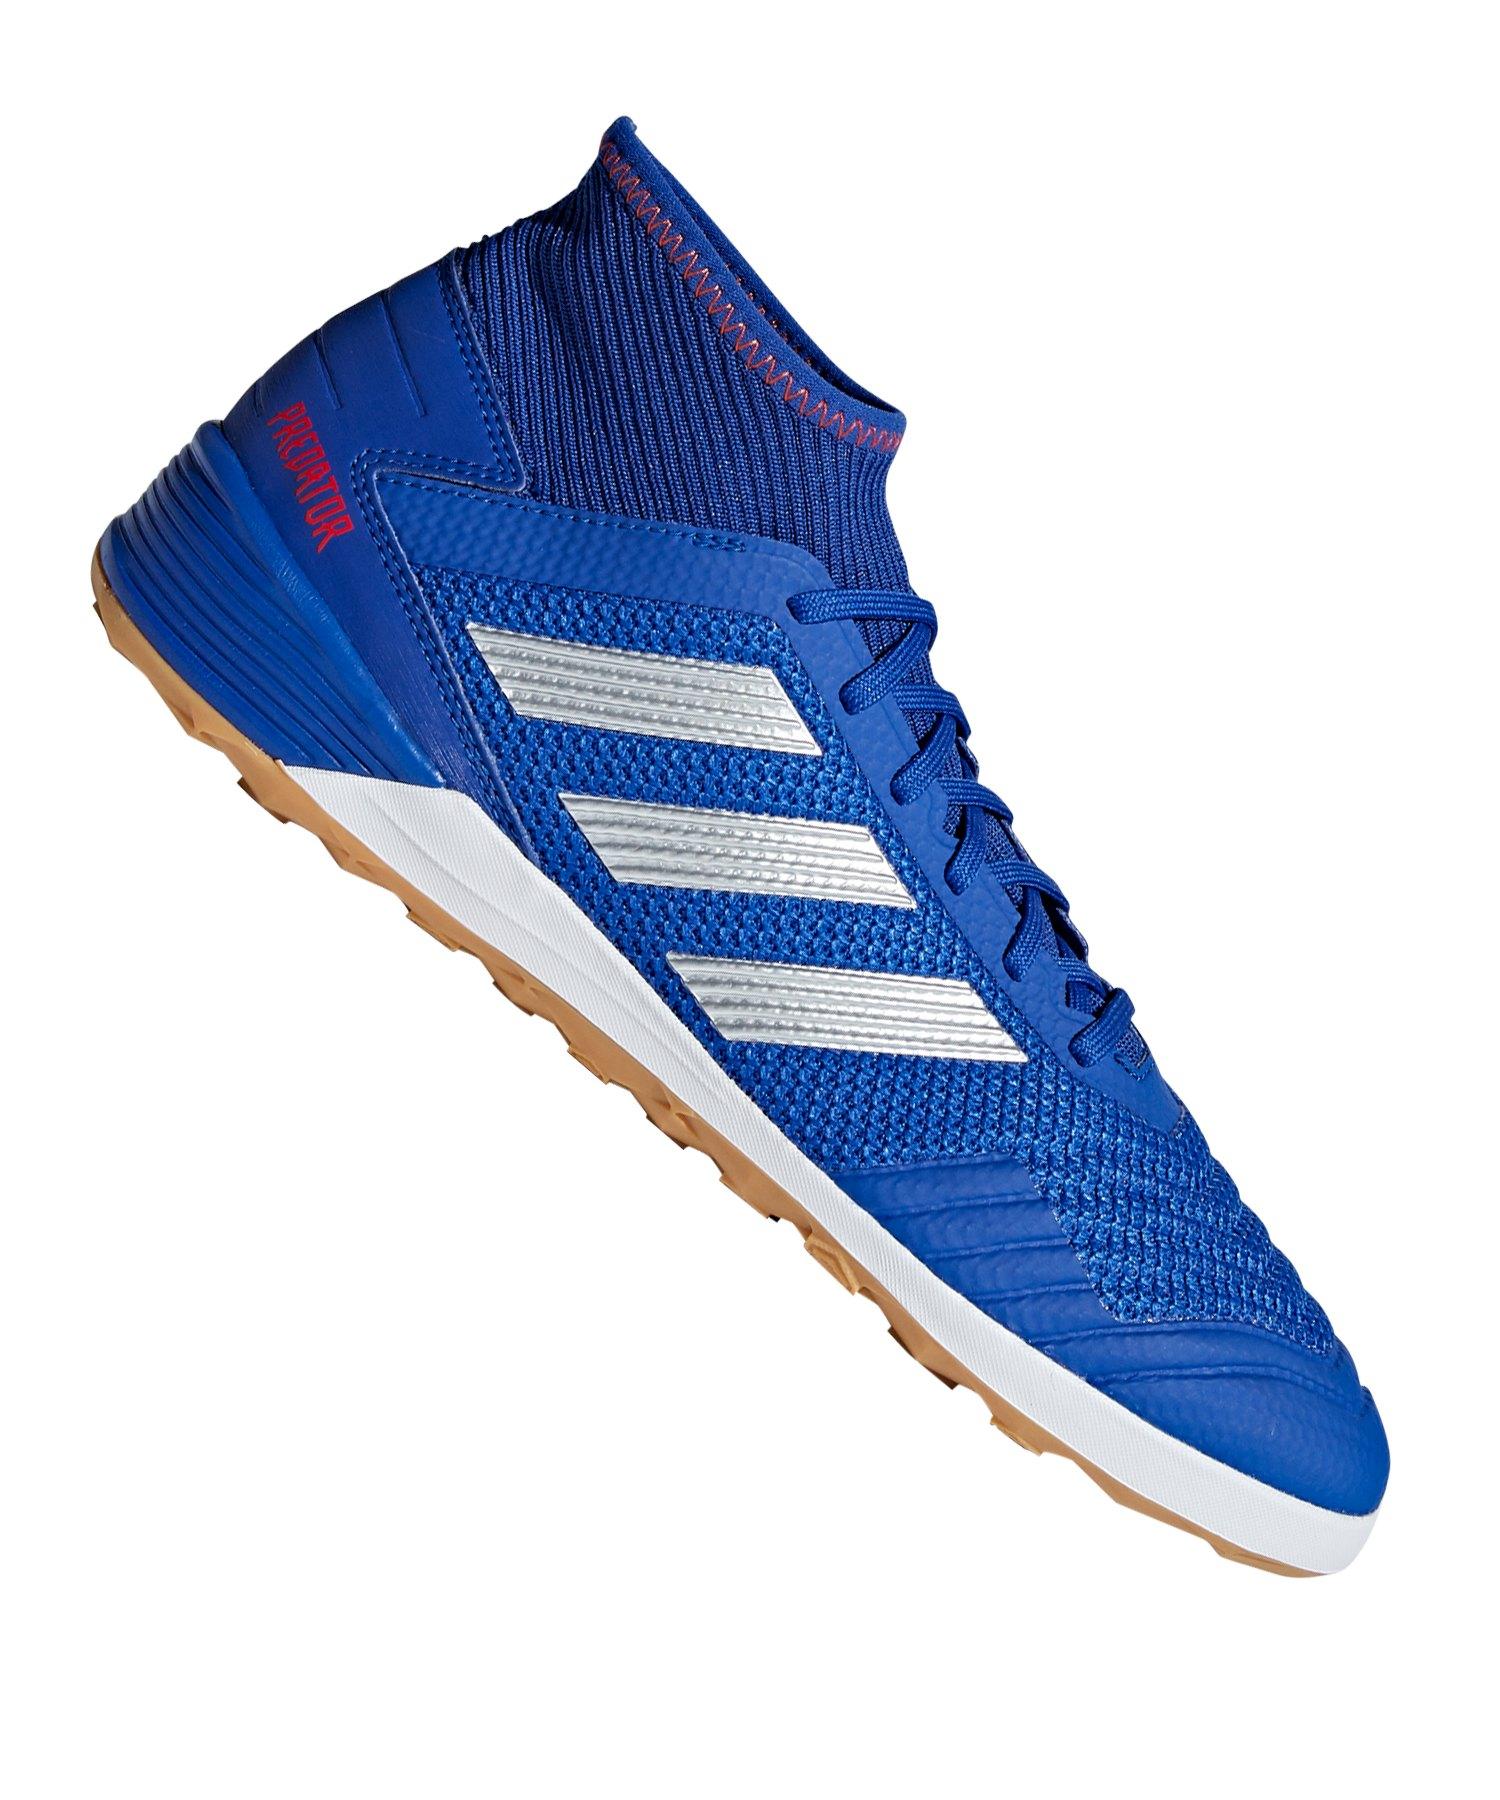 pretty nice 29e58 52ecf adidas Predator 19.3 IN Halle Blau Silber - blau